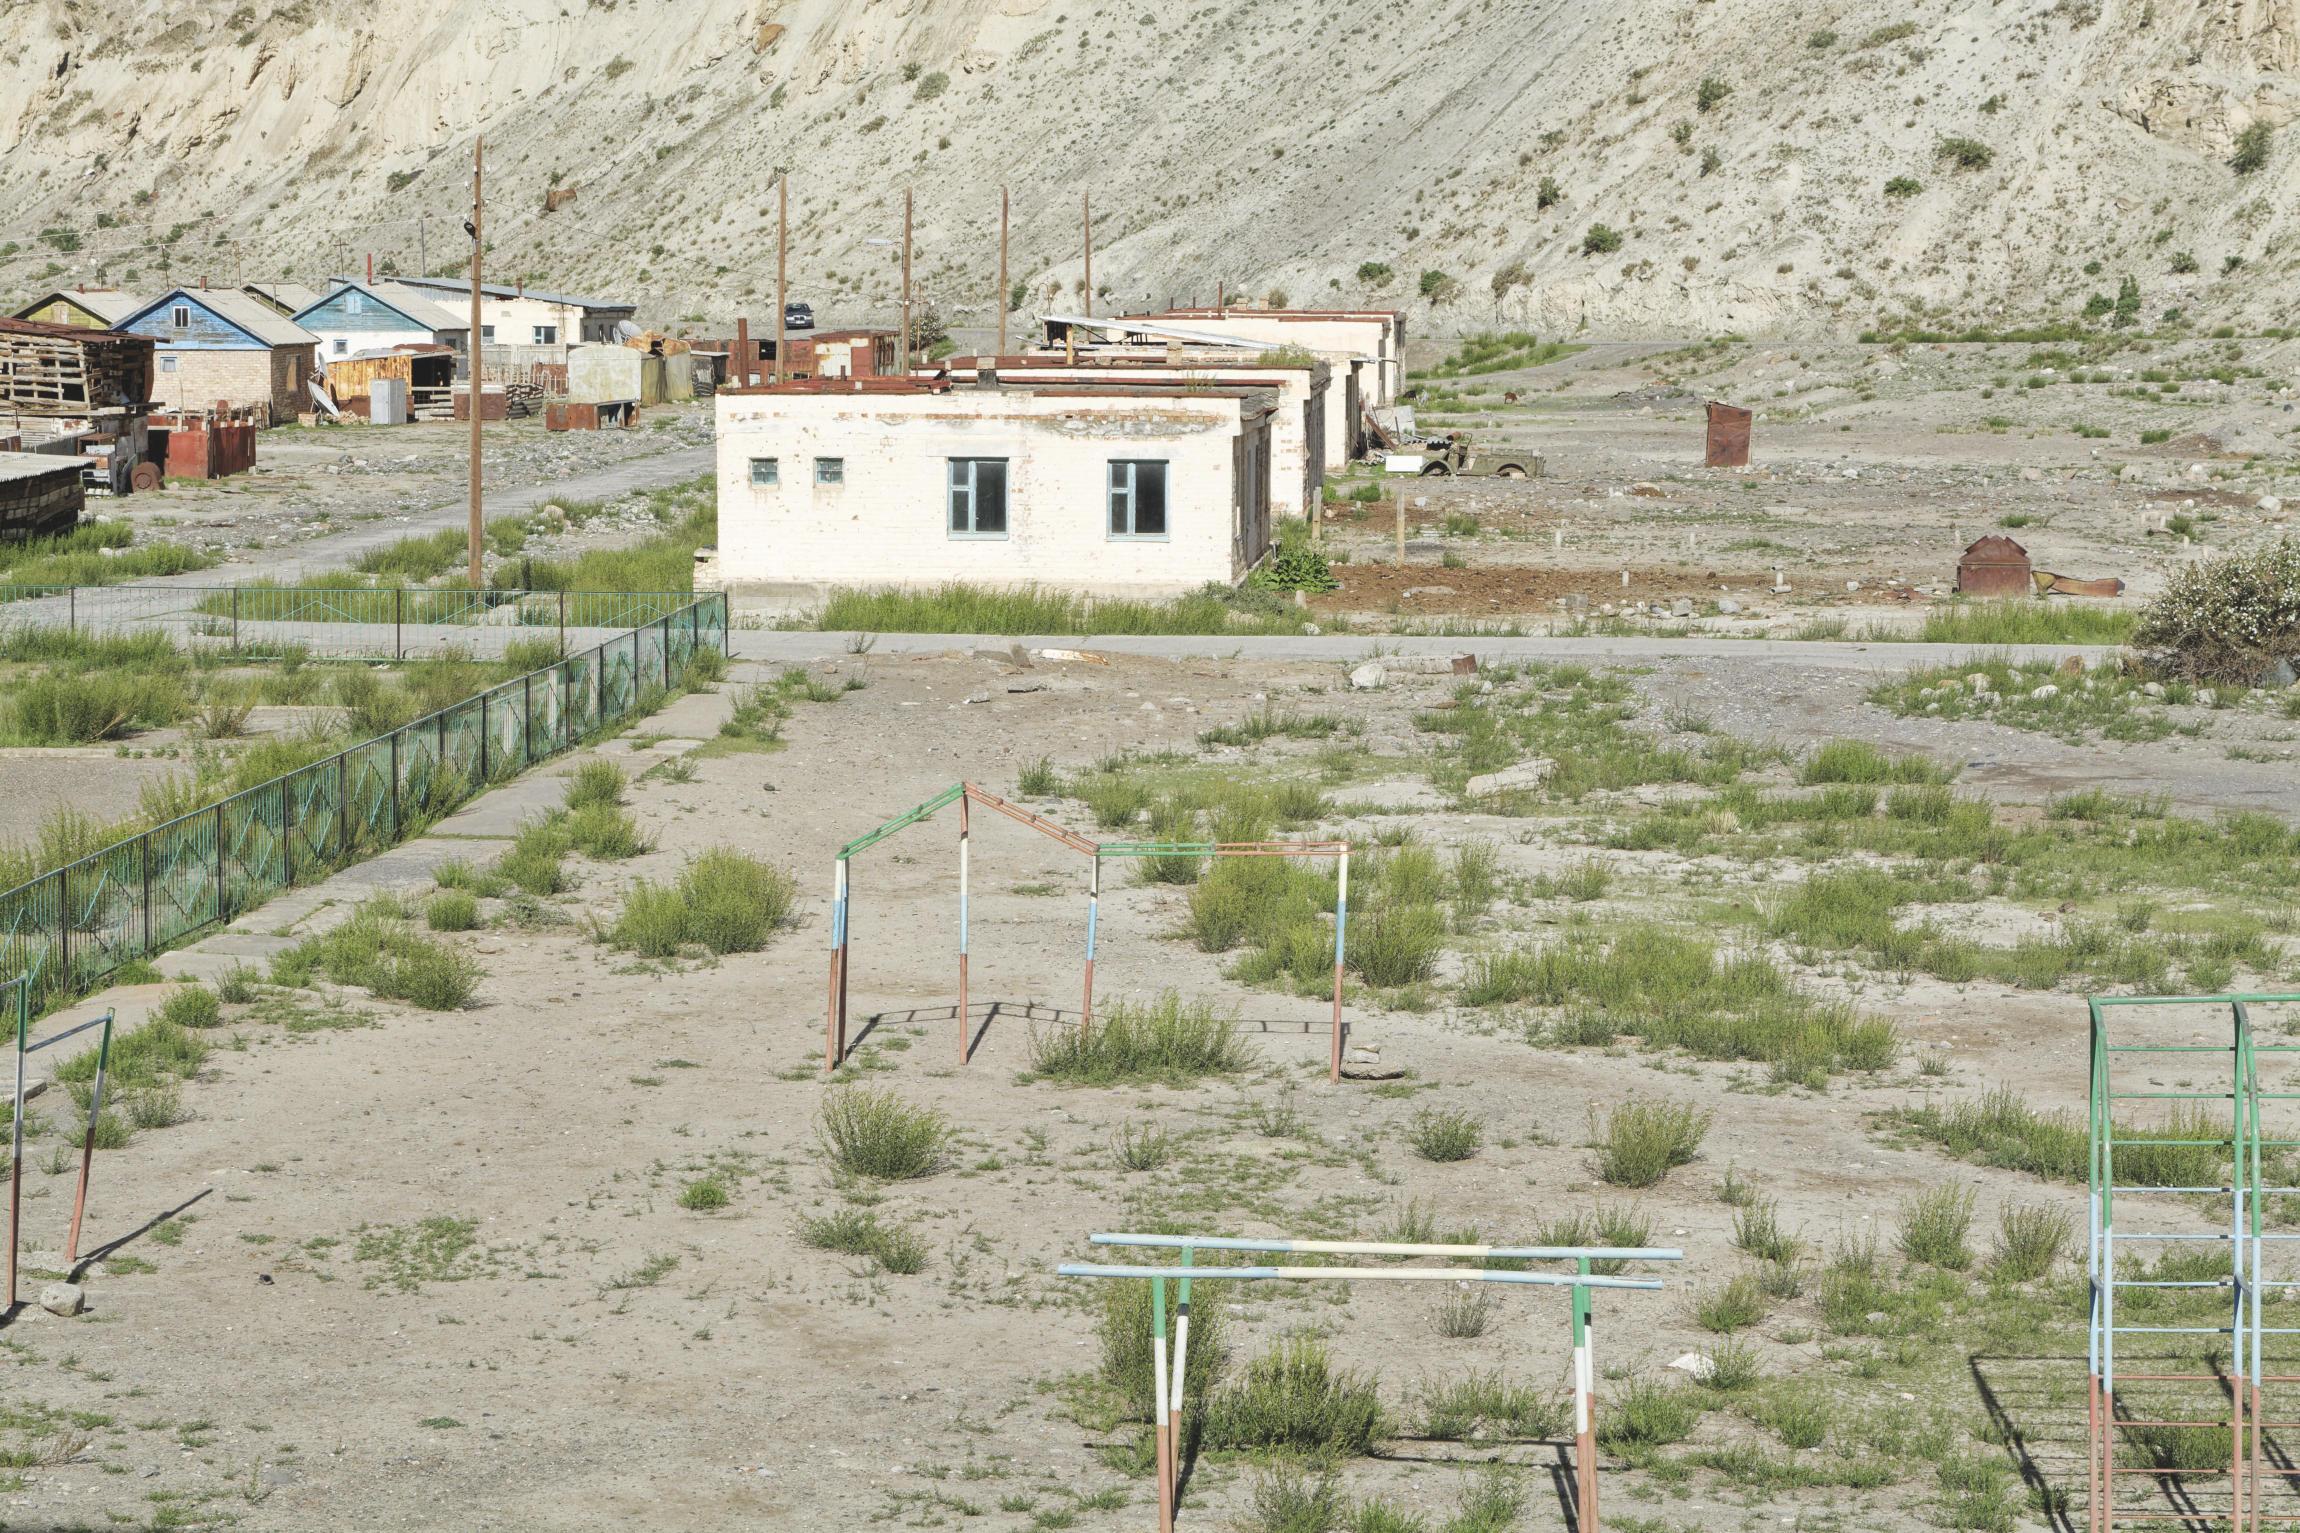 Terrain de jeu à l'abandon Inylchek Kirghizstan